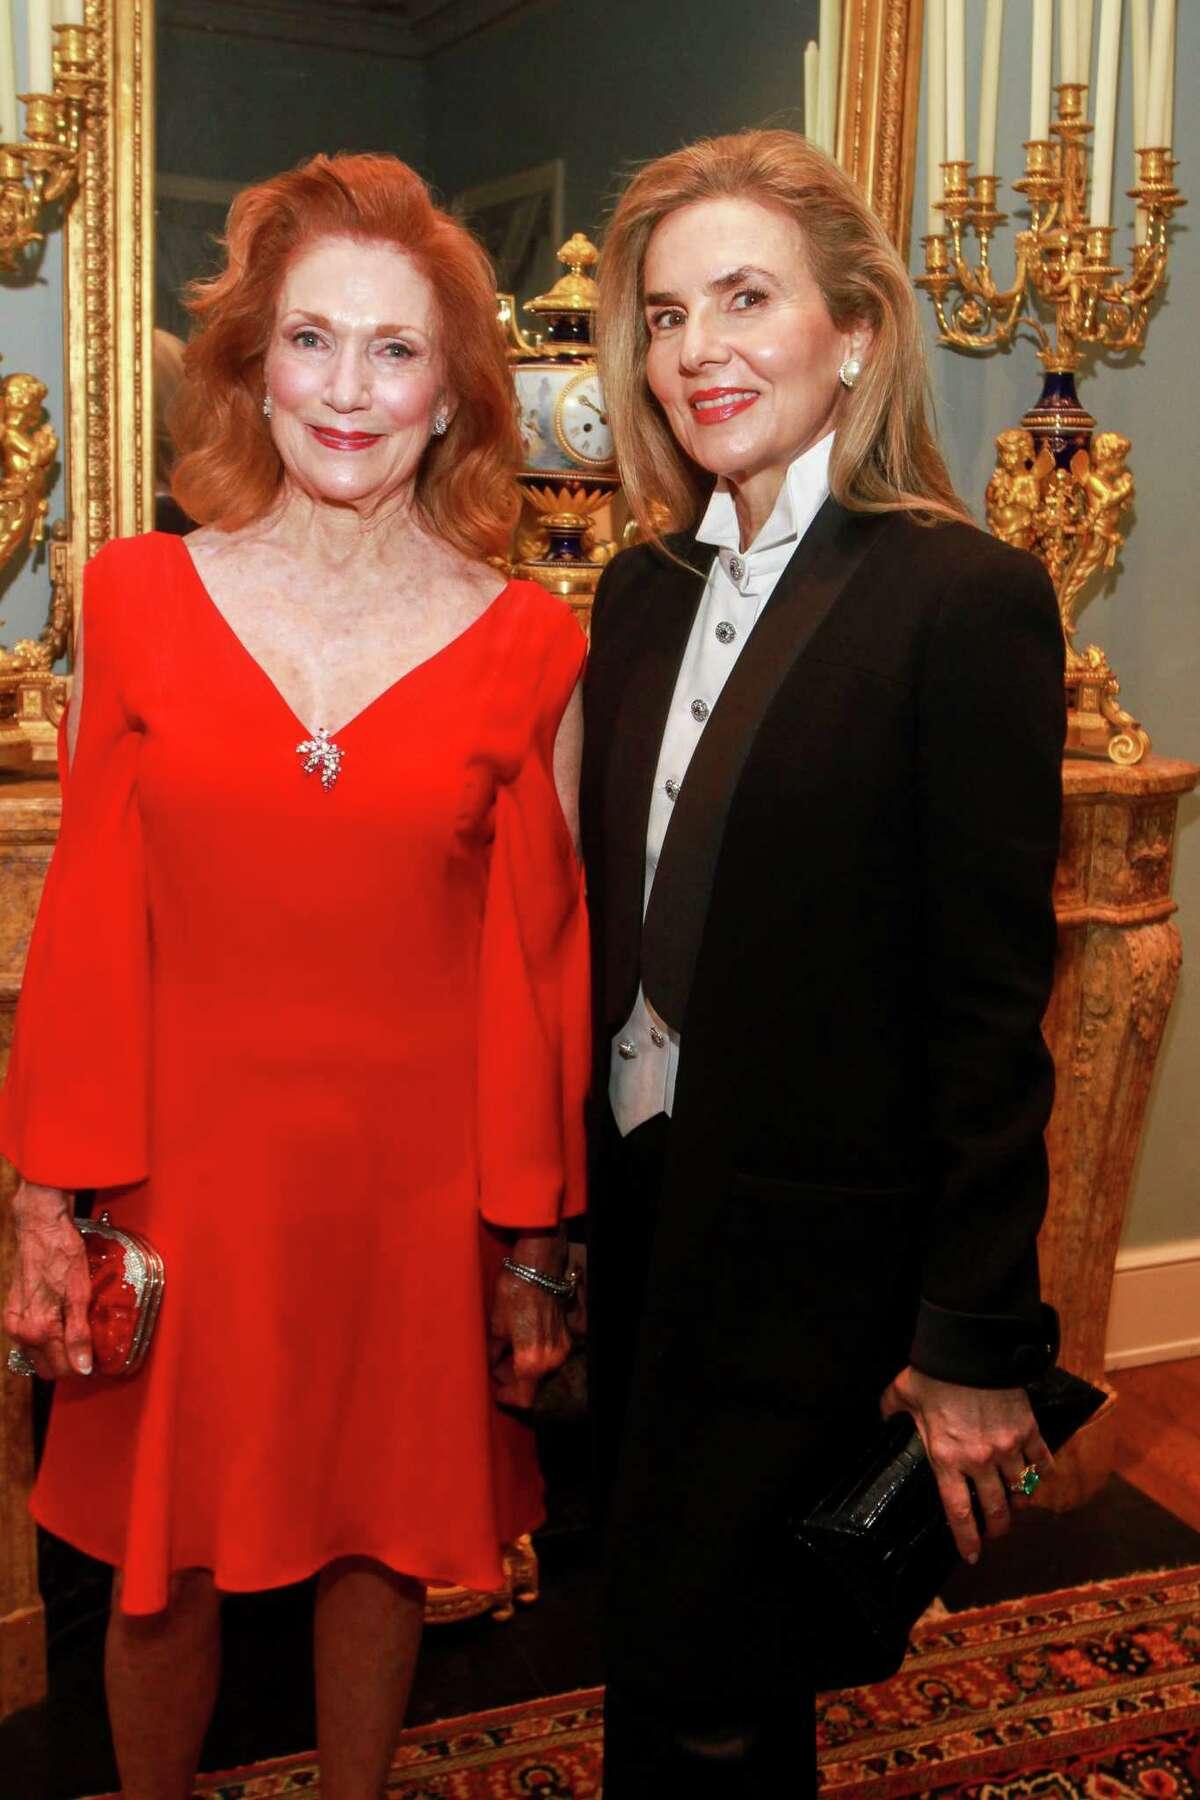 Isla Reckling, left, and Celina Hellmund at MFAH's annual Rienzi Society dinner.